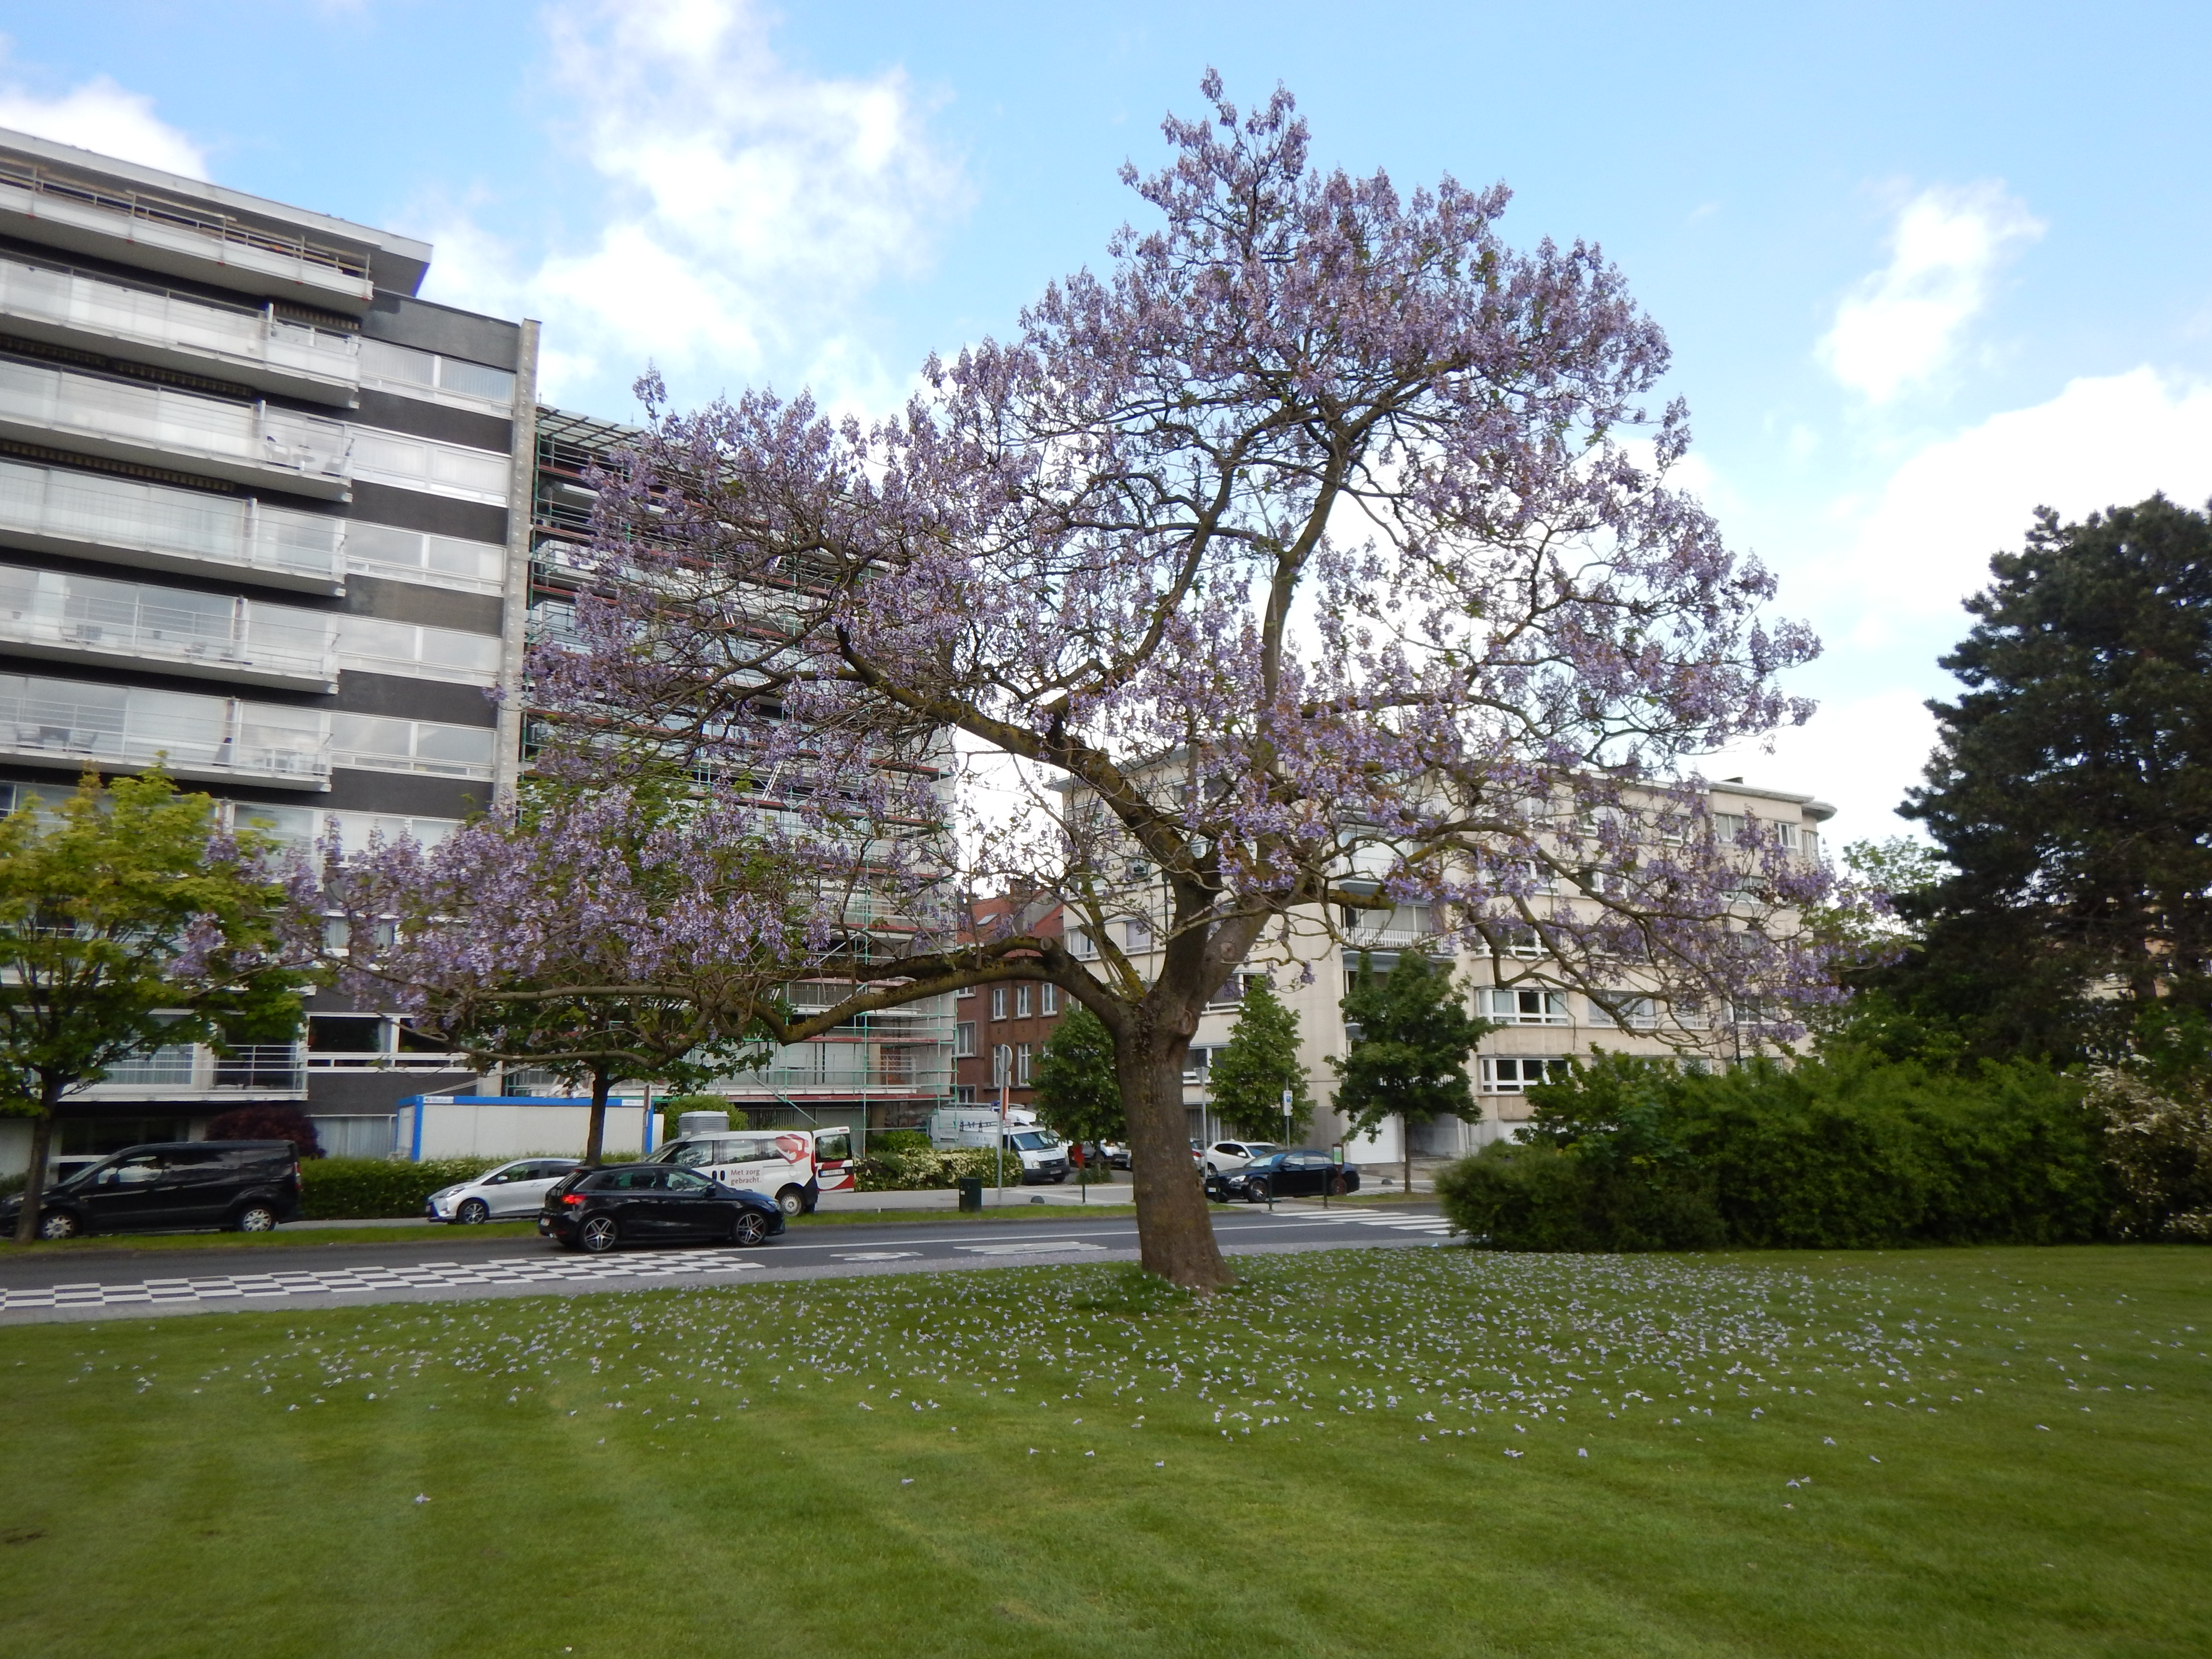 Paulownia impérial – Molenbeek-Saint-Jean, Boulevard Edmond Machtens –  12 Mars 2020